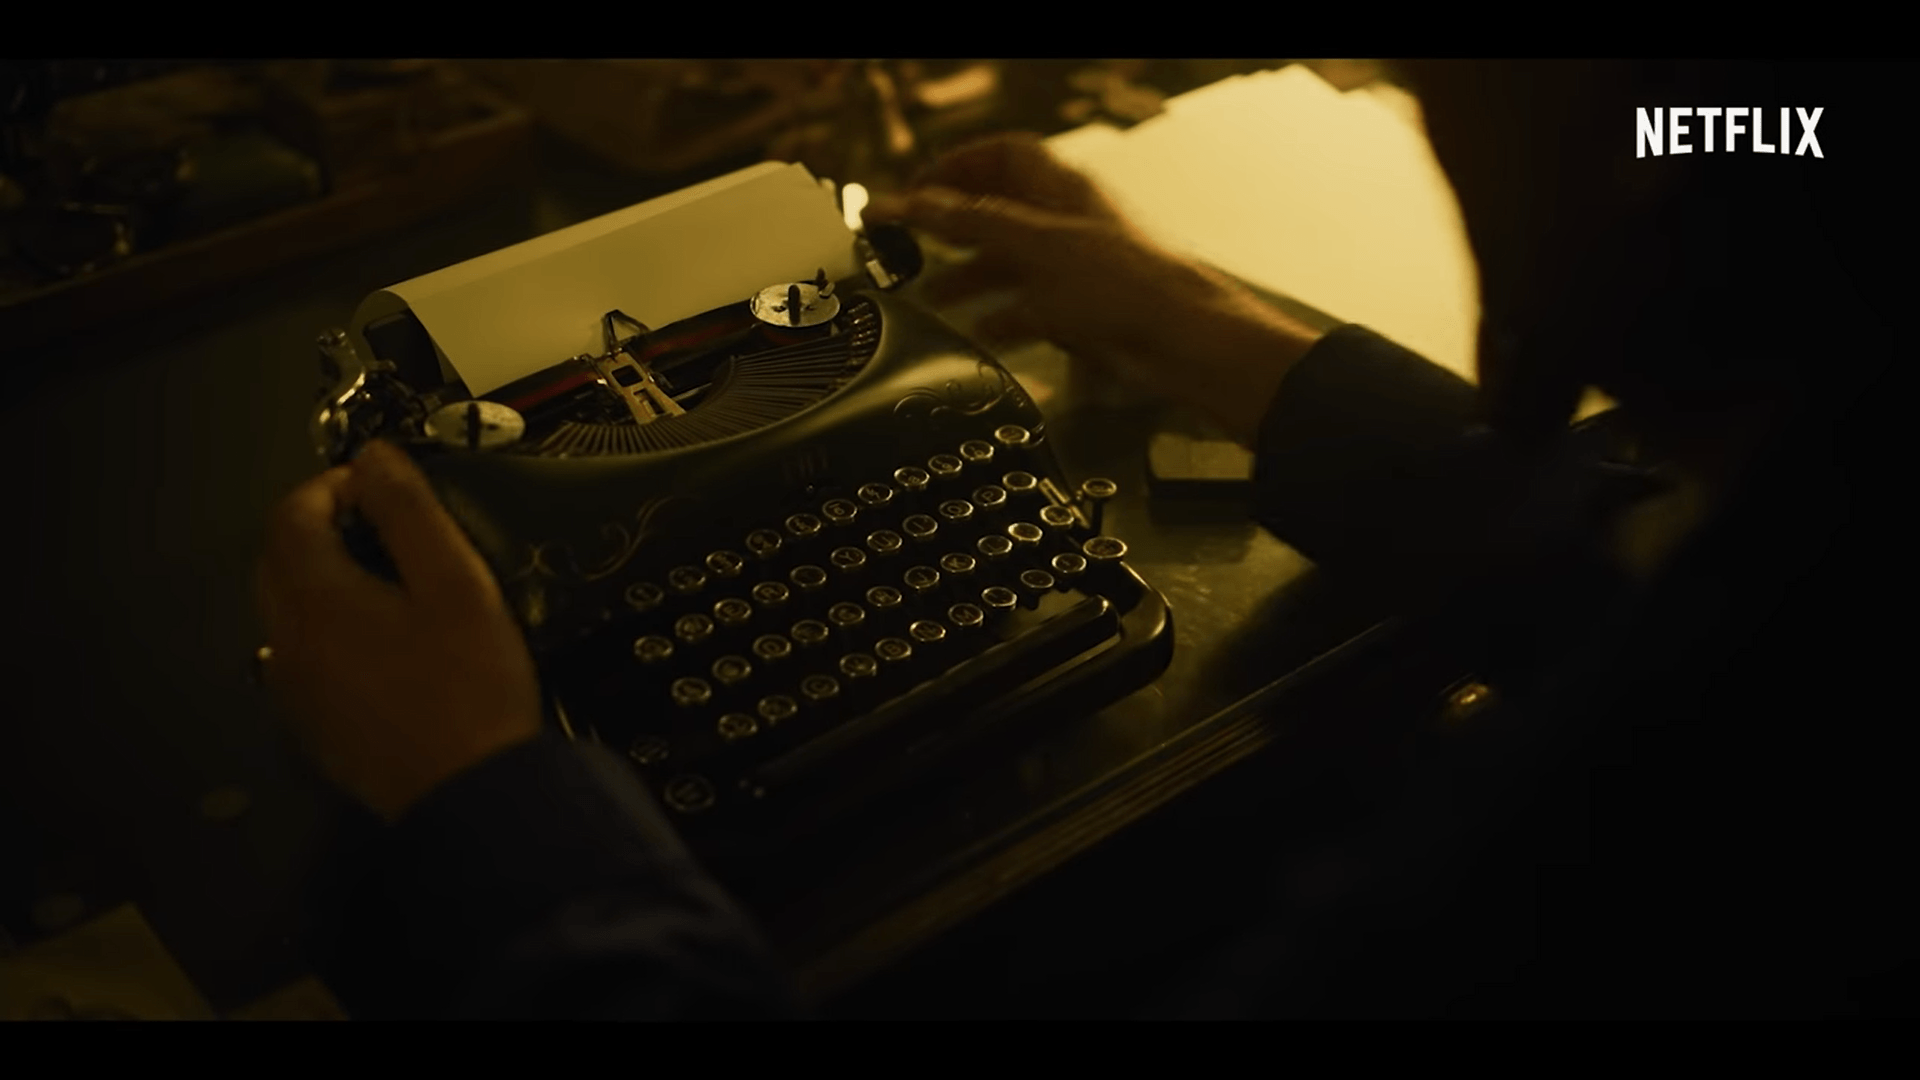 Typewriter Netflix Wallpapers - Wallpaper Cave